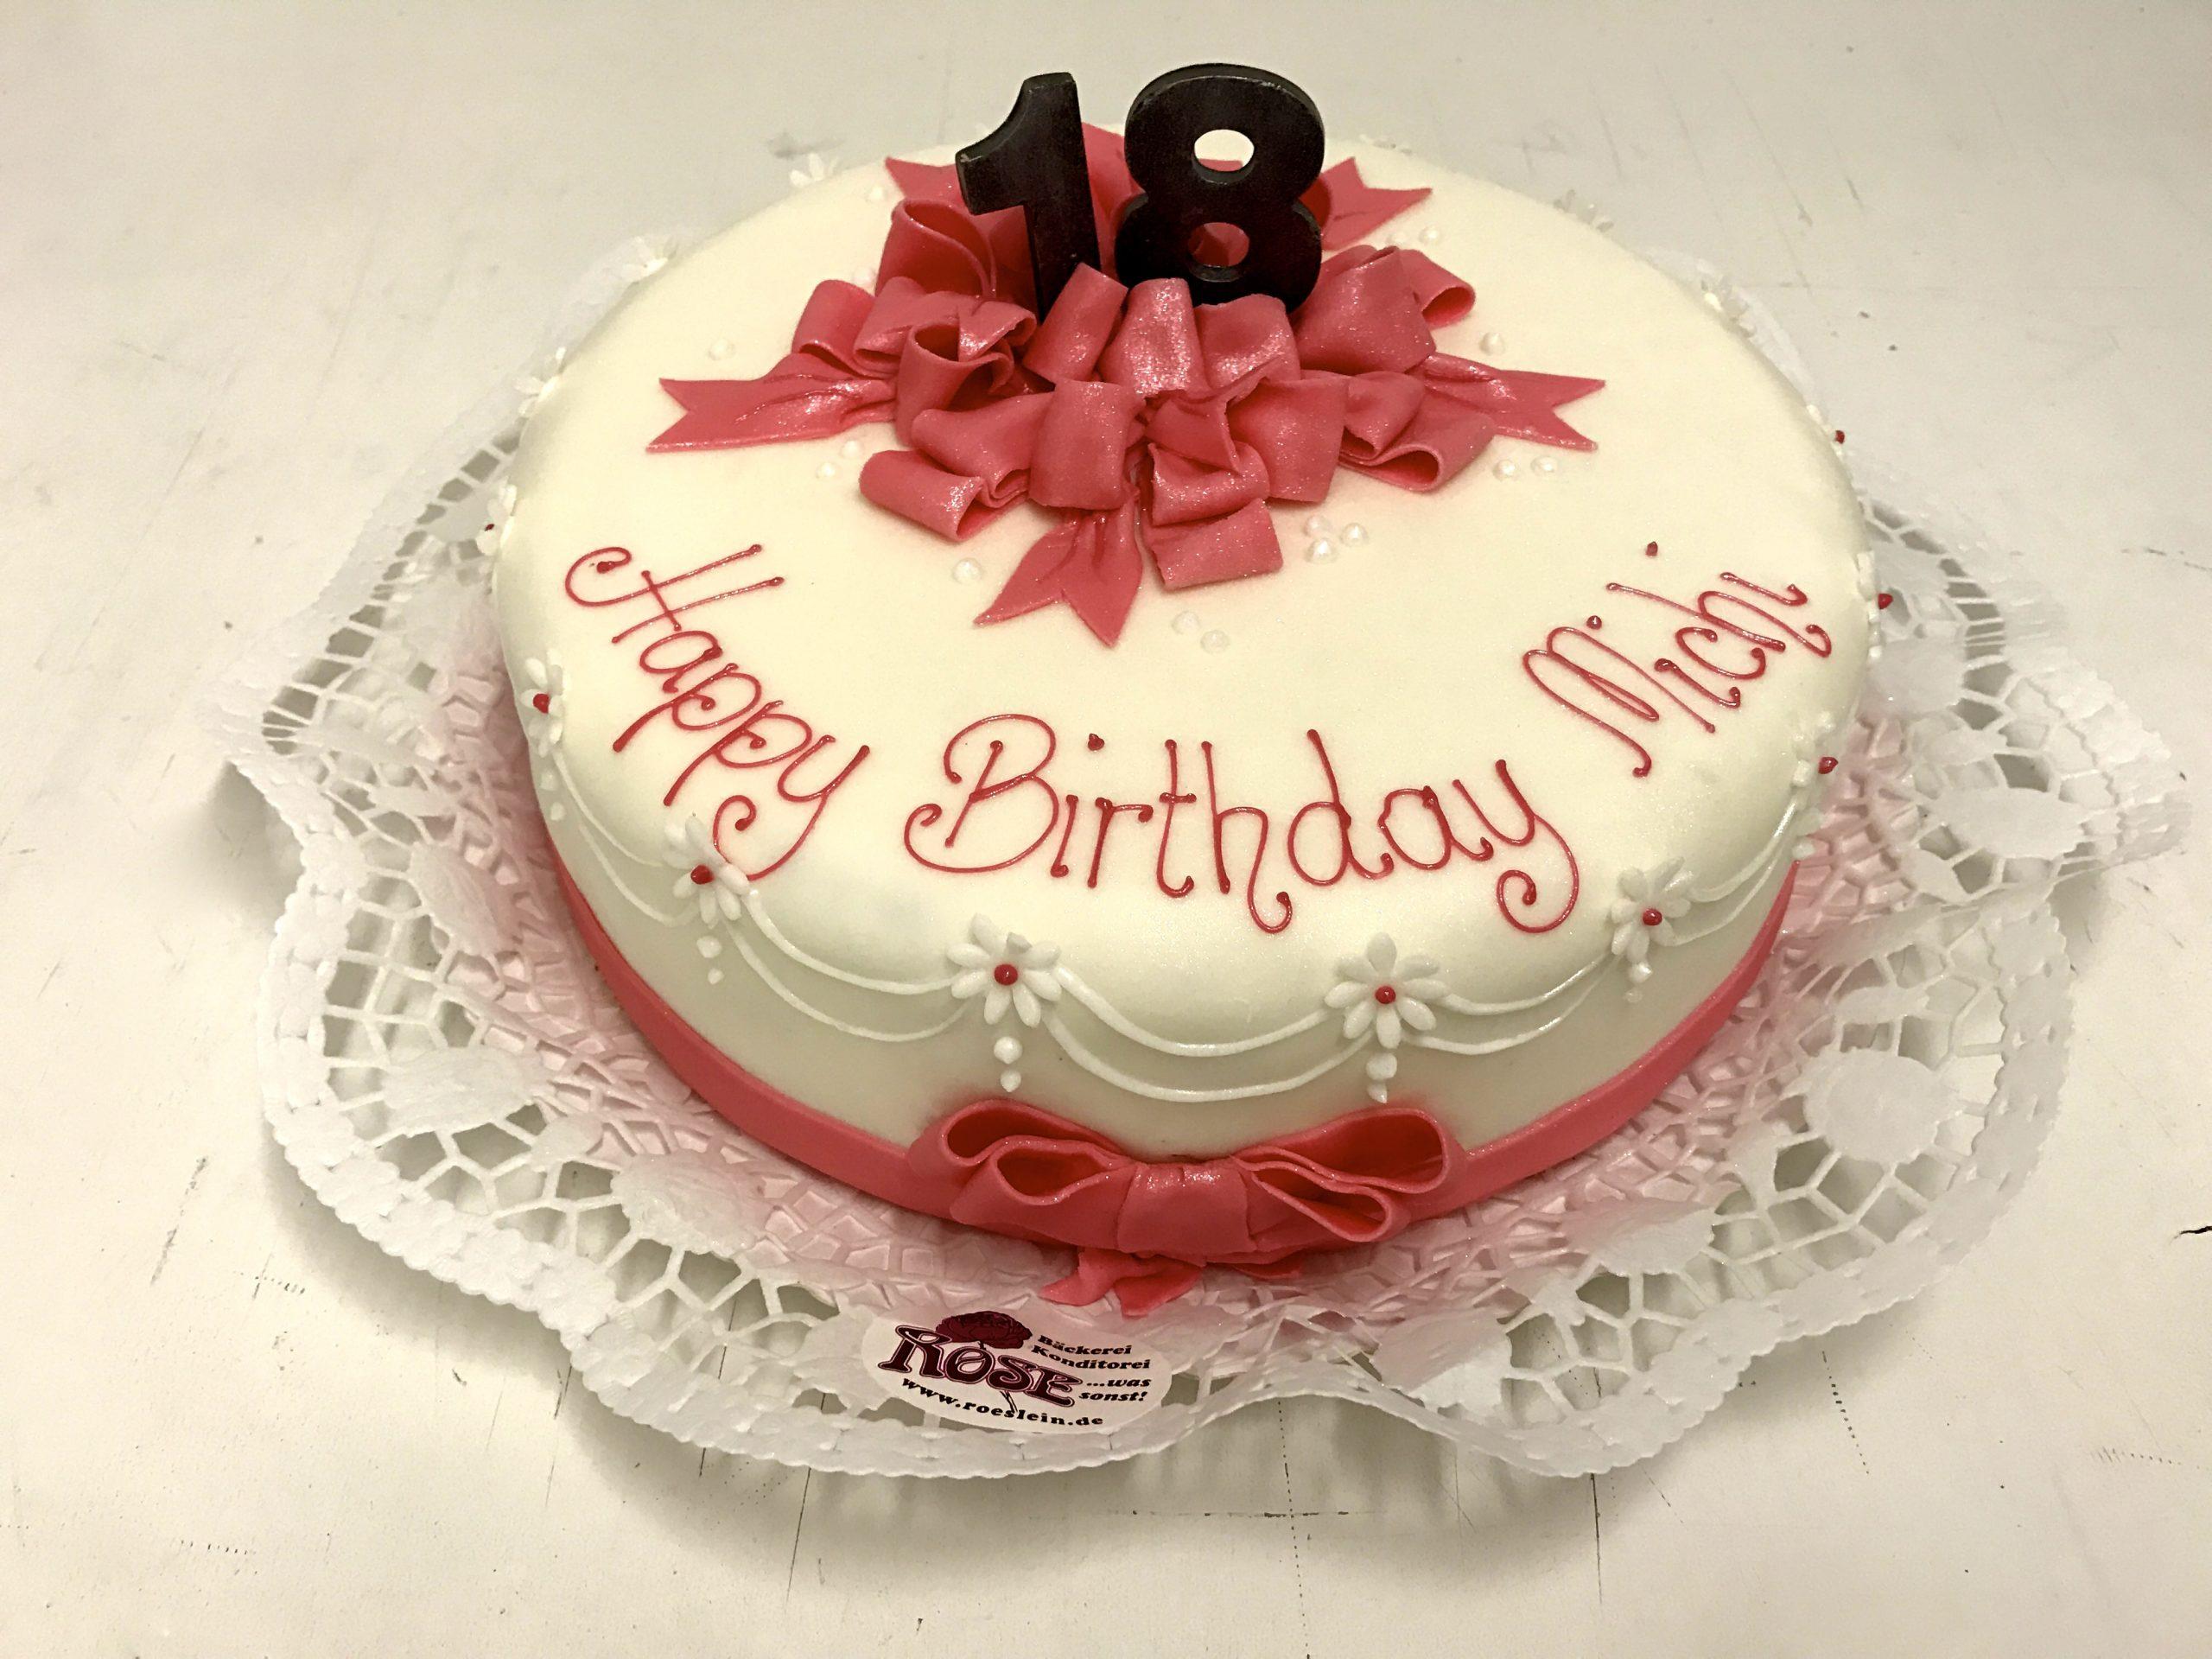 Roses Fantastische Geburtstagstorten ganzes Bilder Geburtstagstorten